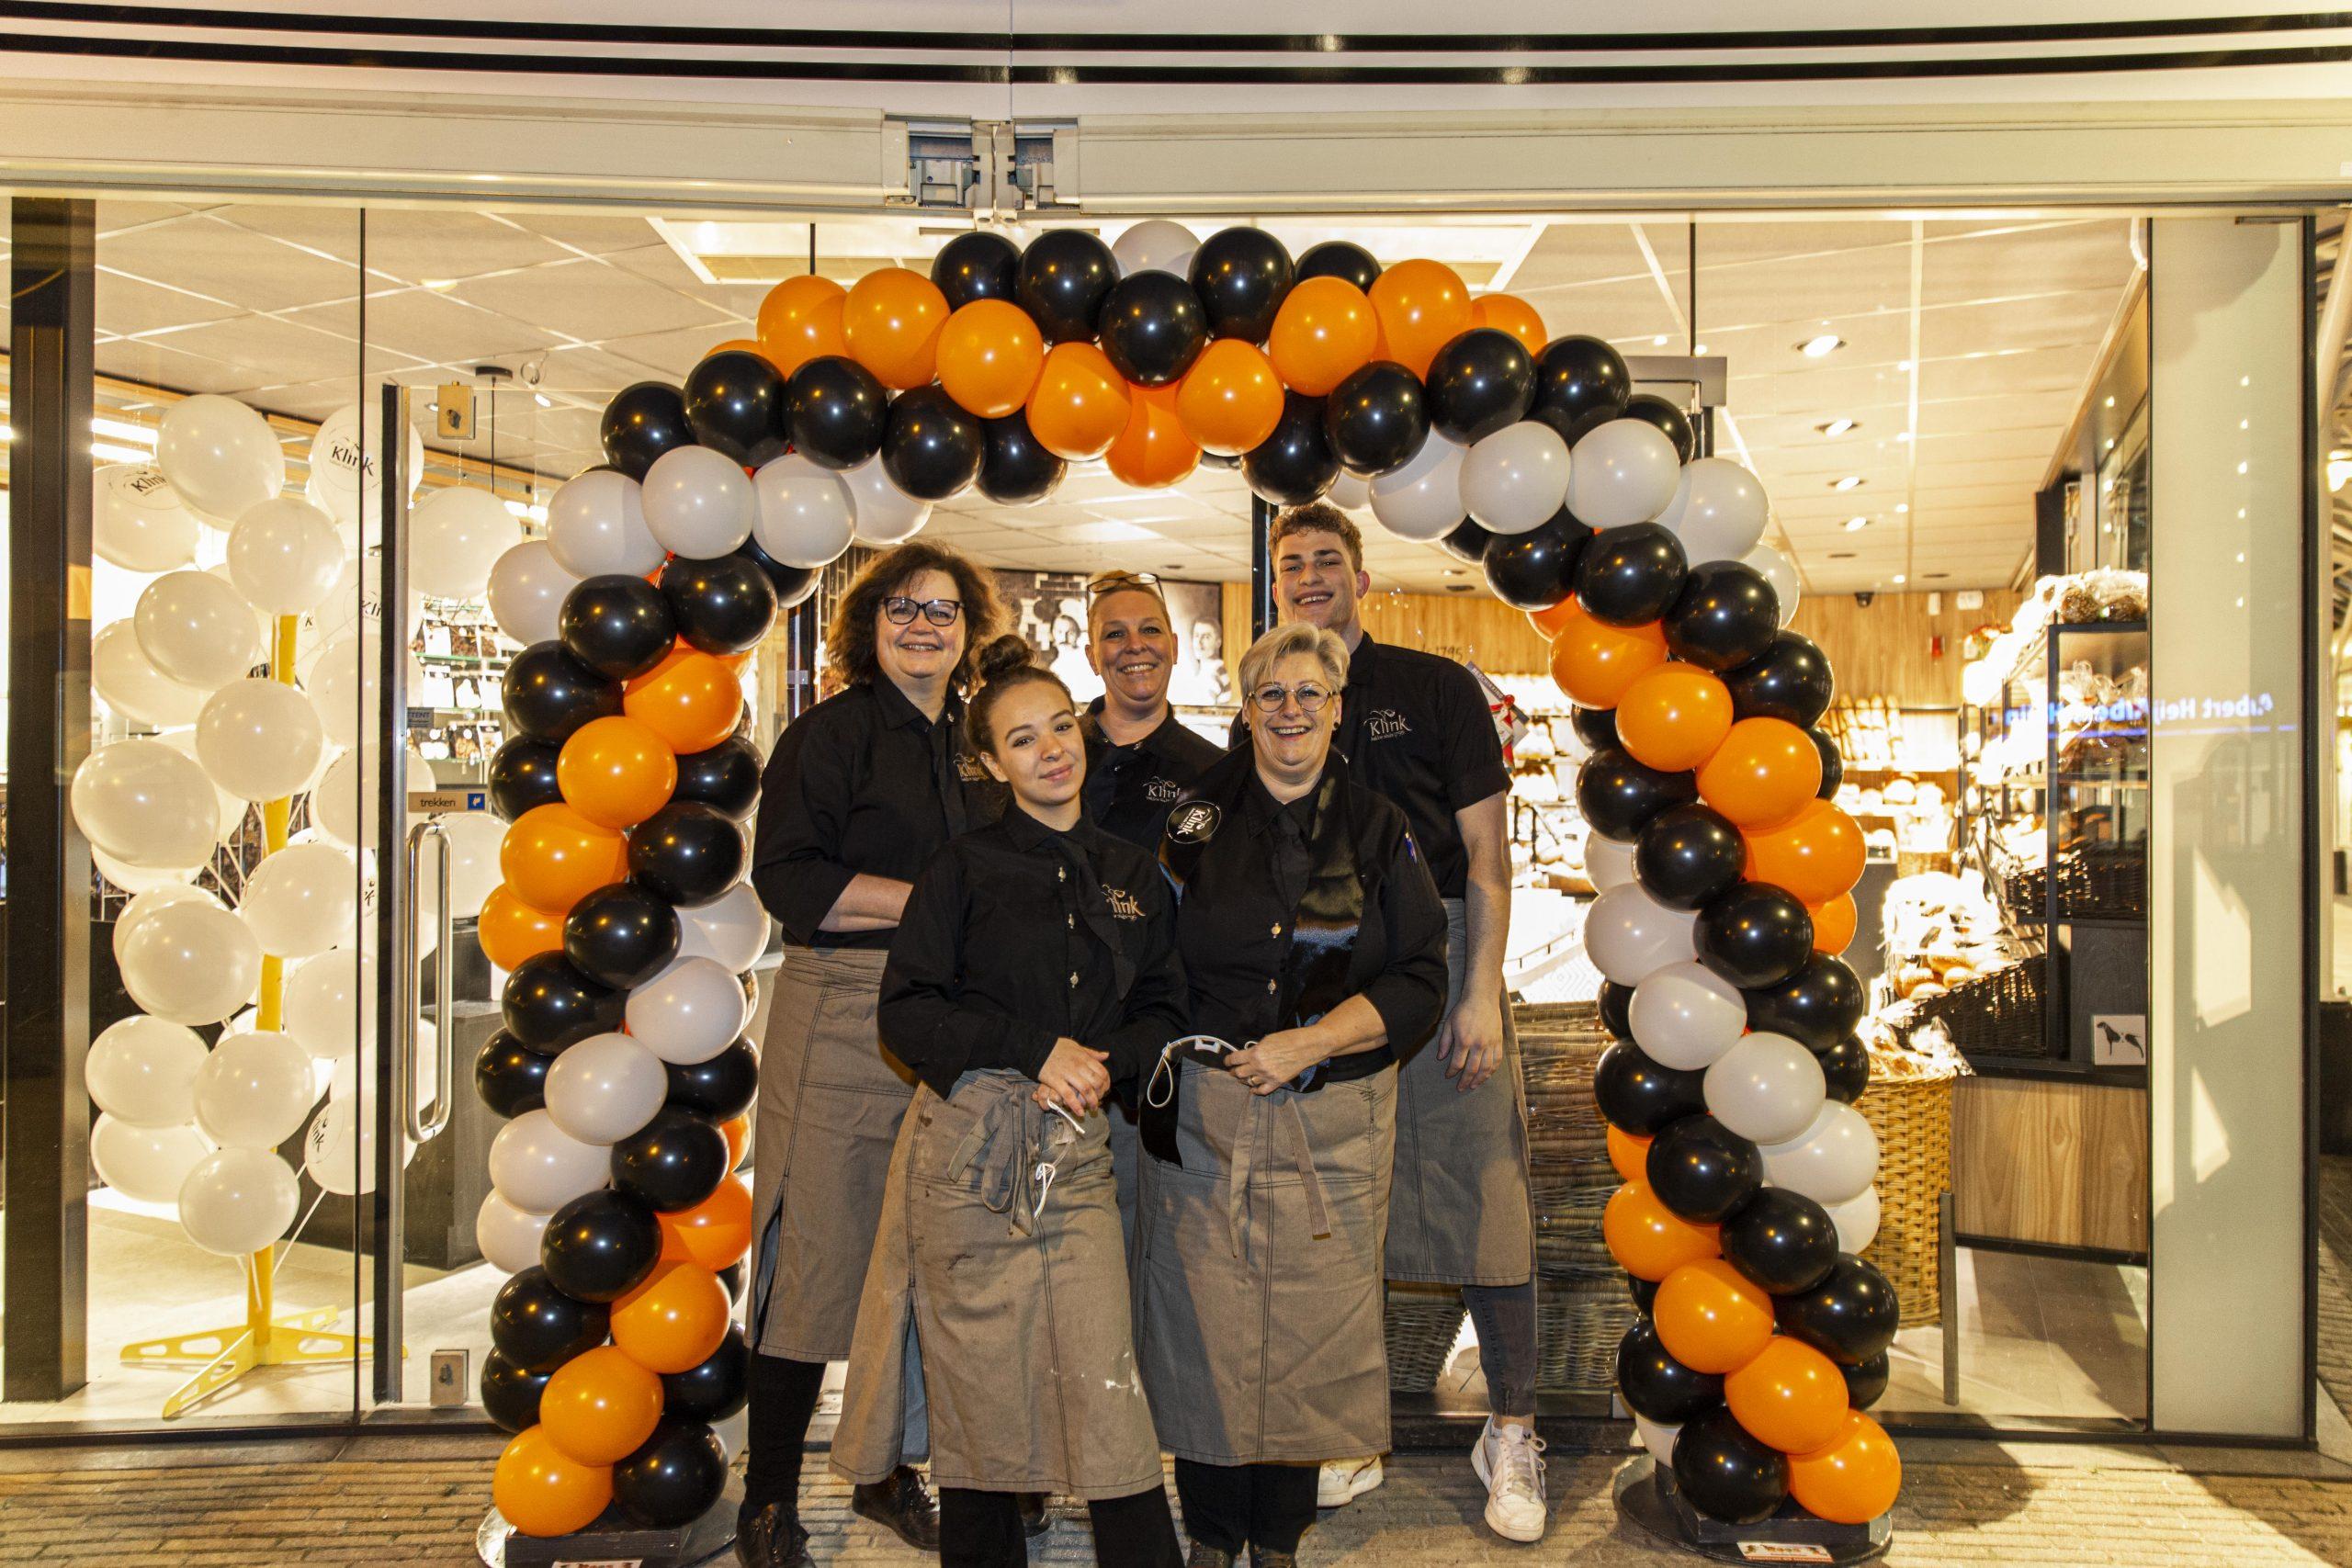 Bakker Klink winkel Koningin Julianalaan opening team